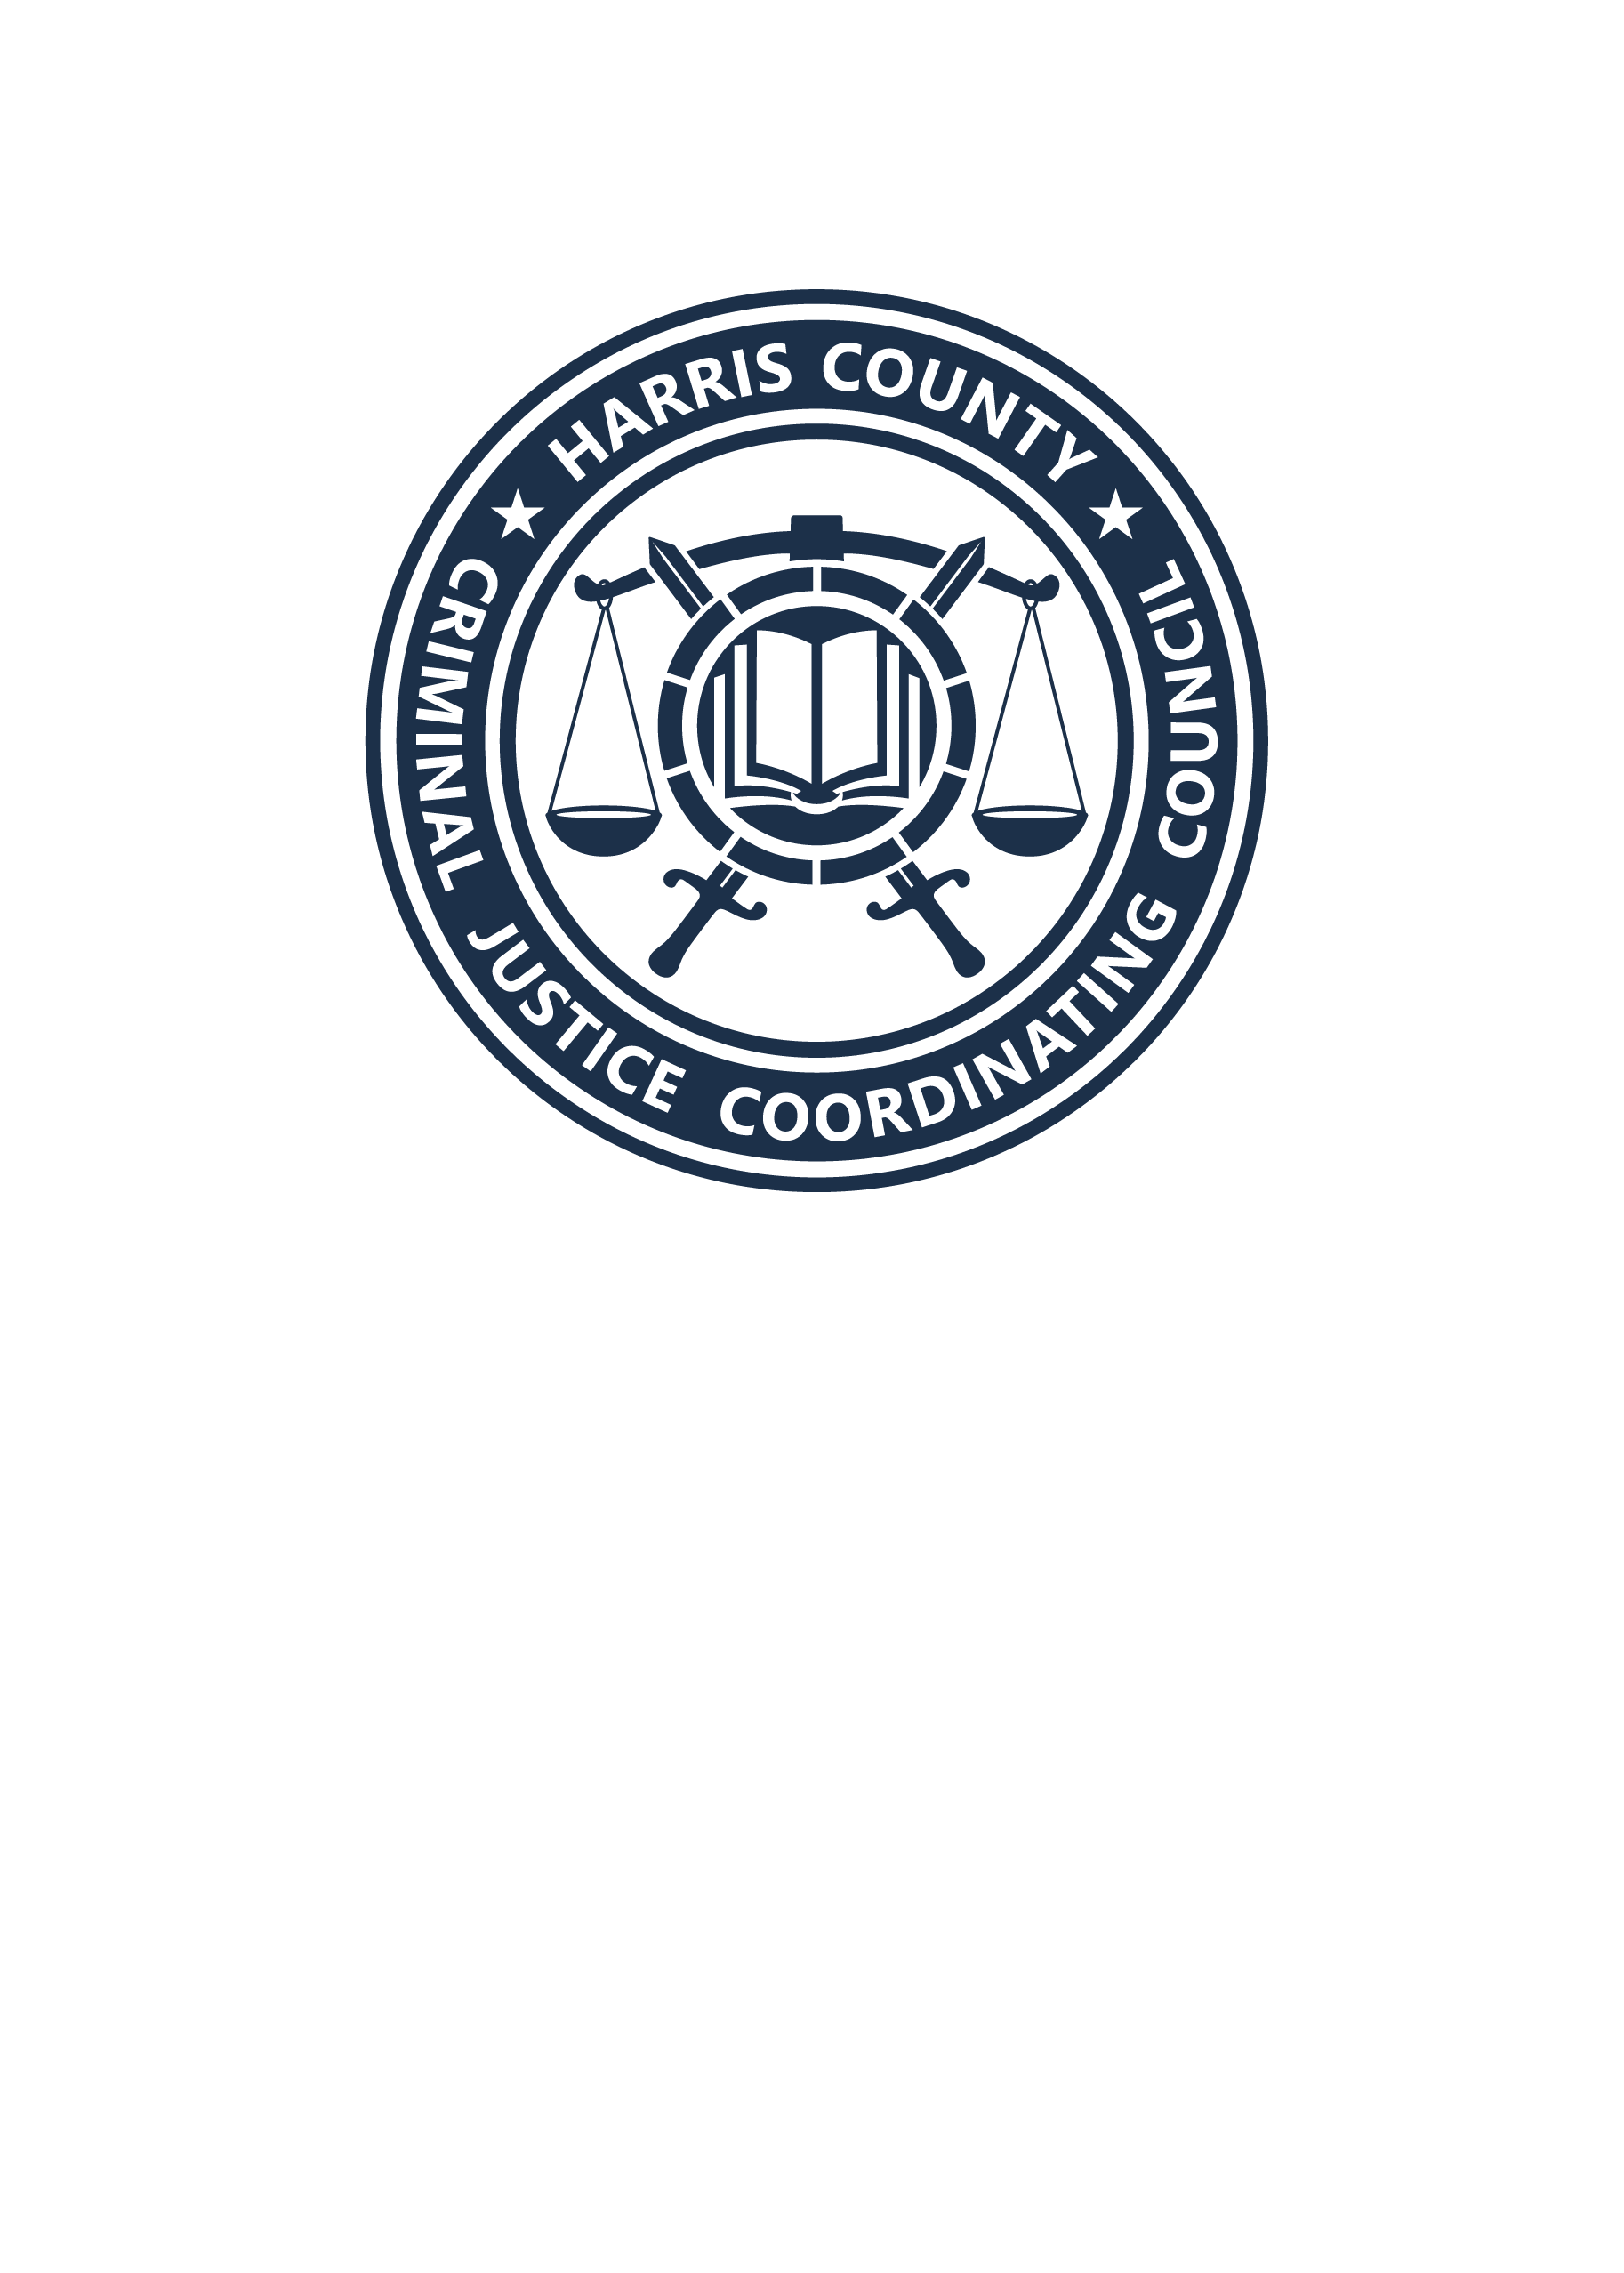 CJCC_Logo_Tall-01.png